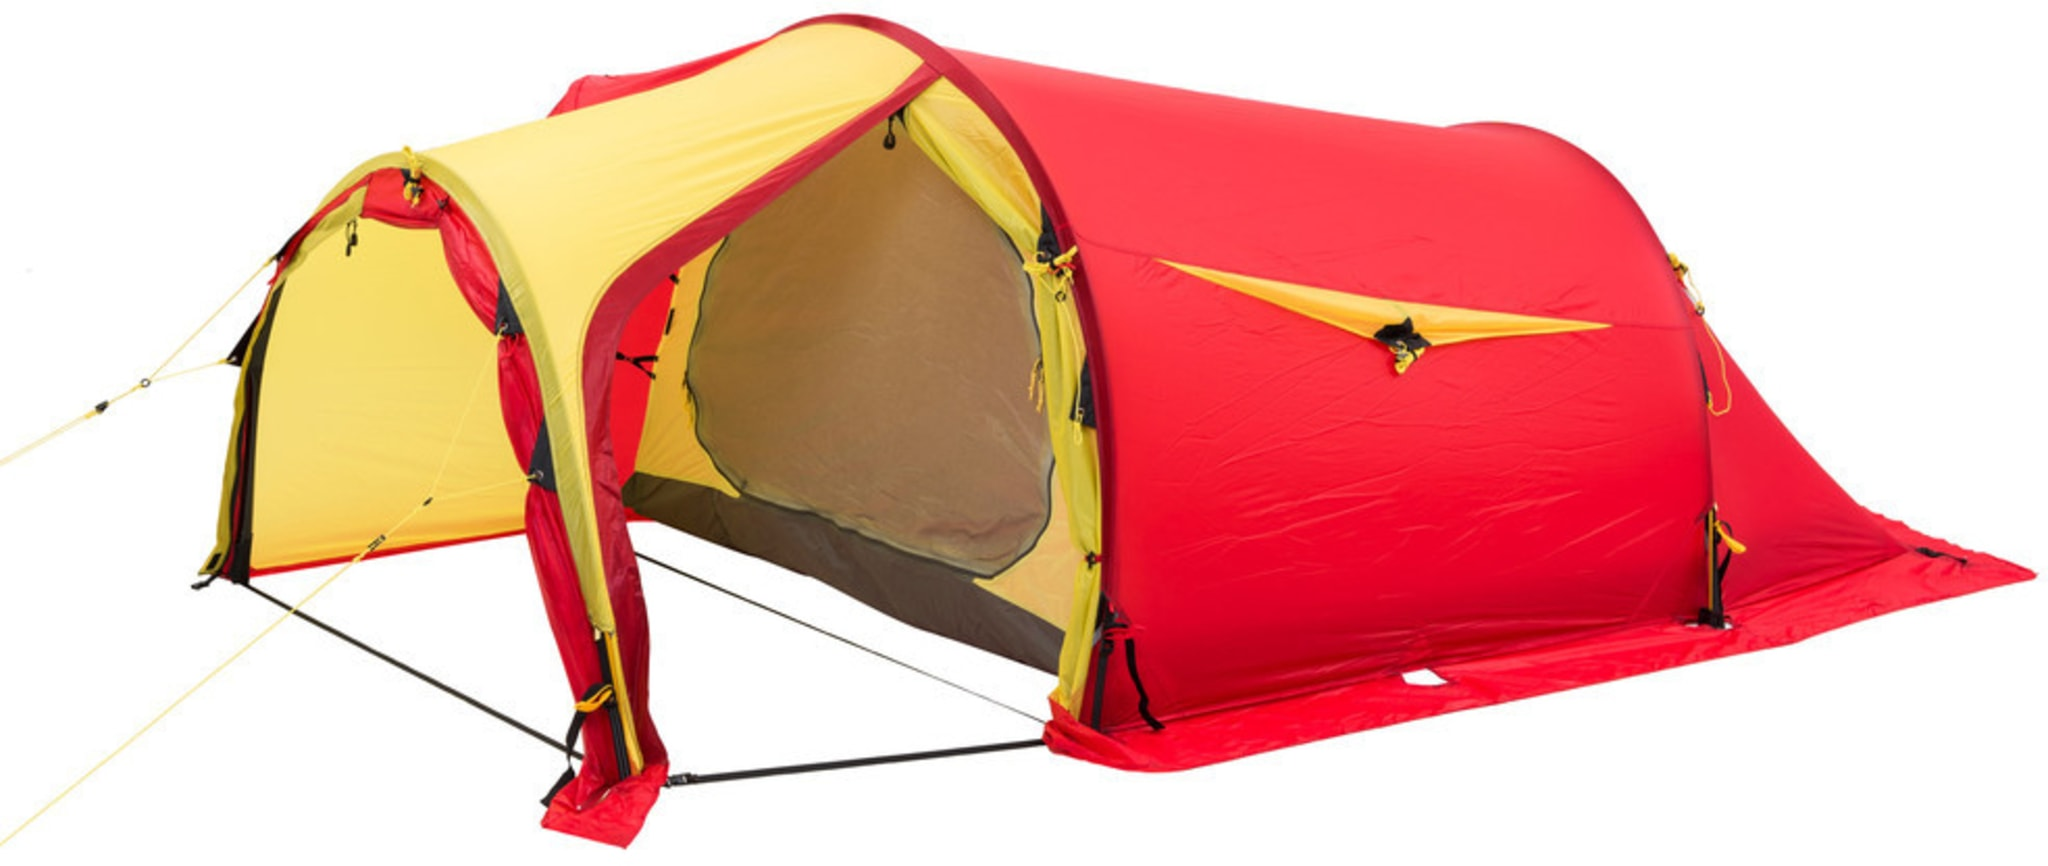 Lofoten X-trem 3 Camp